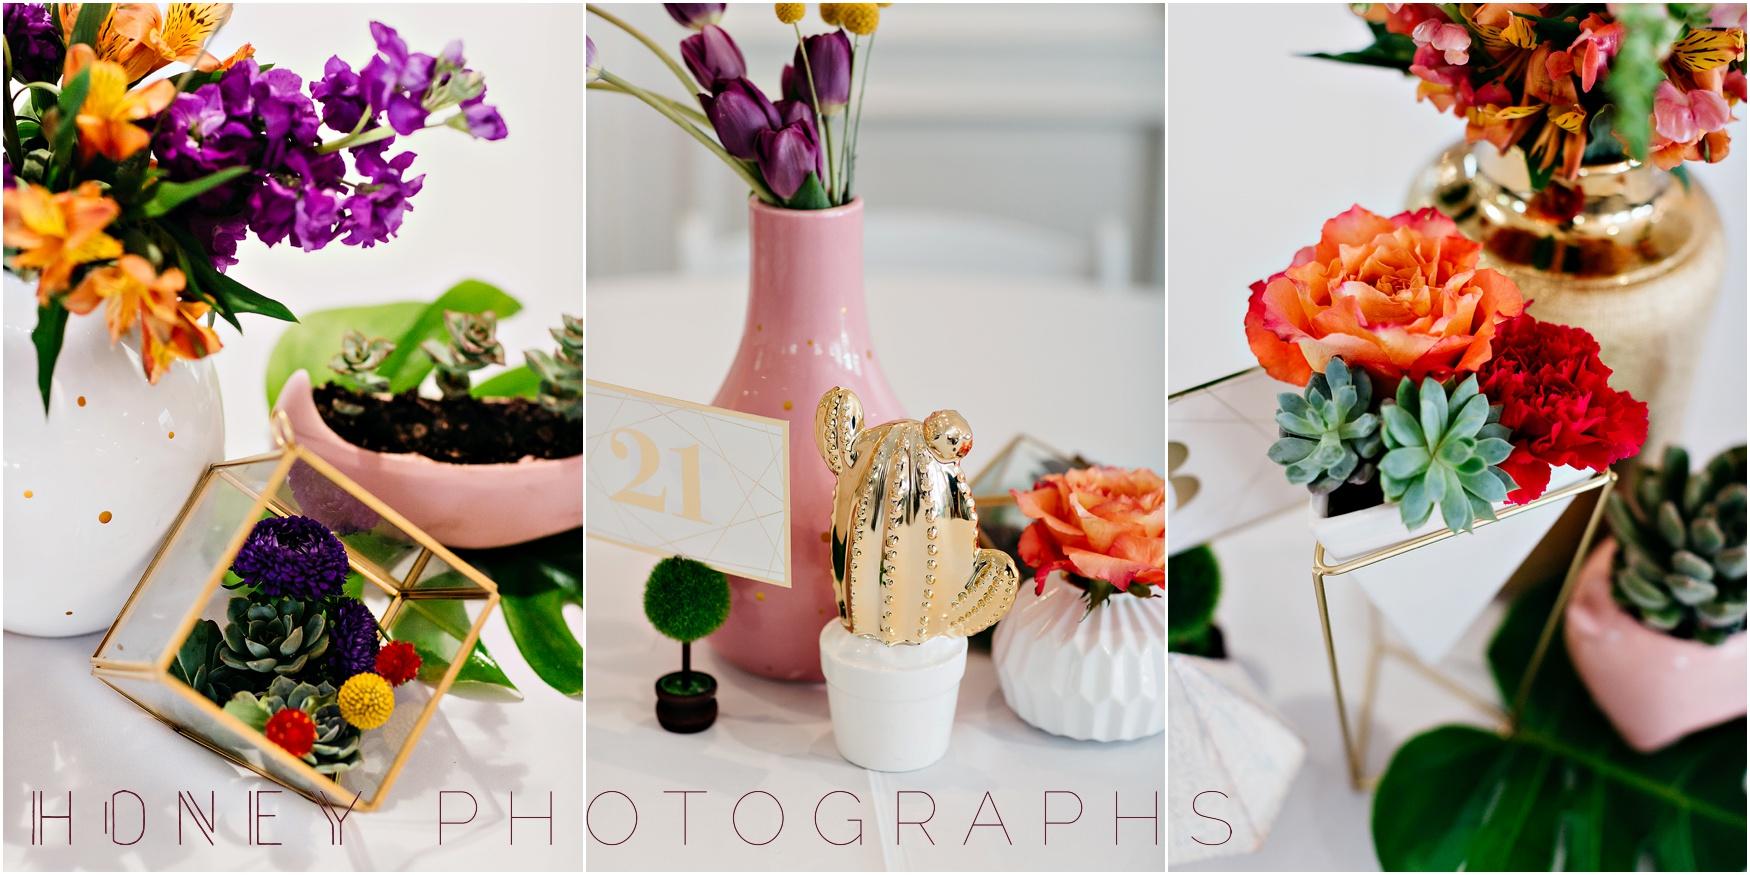 colorful_ecclectic_vibrant_vista_rainbow_quirky_wedding045.jpg